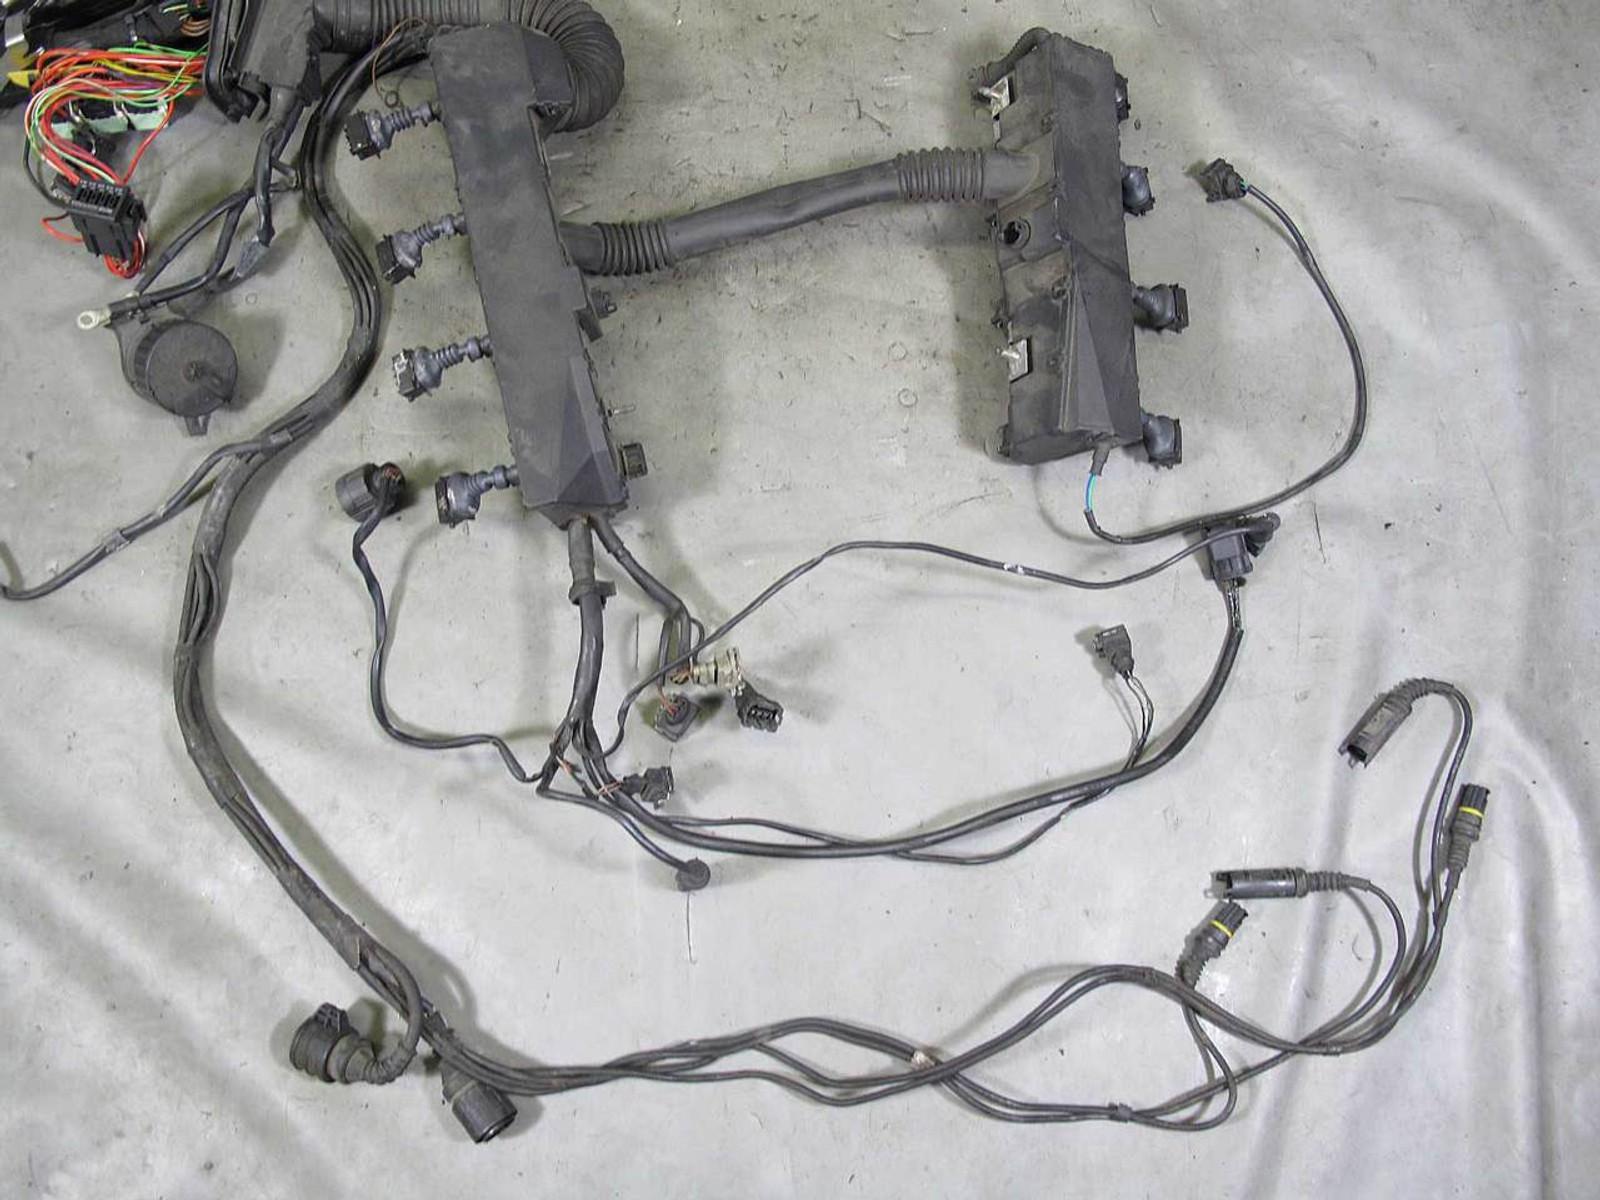 hight resolution of bmw 740il engine wiring harness wiring diagram third level 1998 bmw 740il body kit 1996 1997